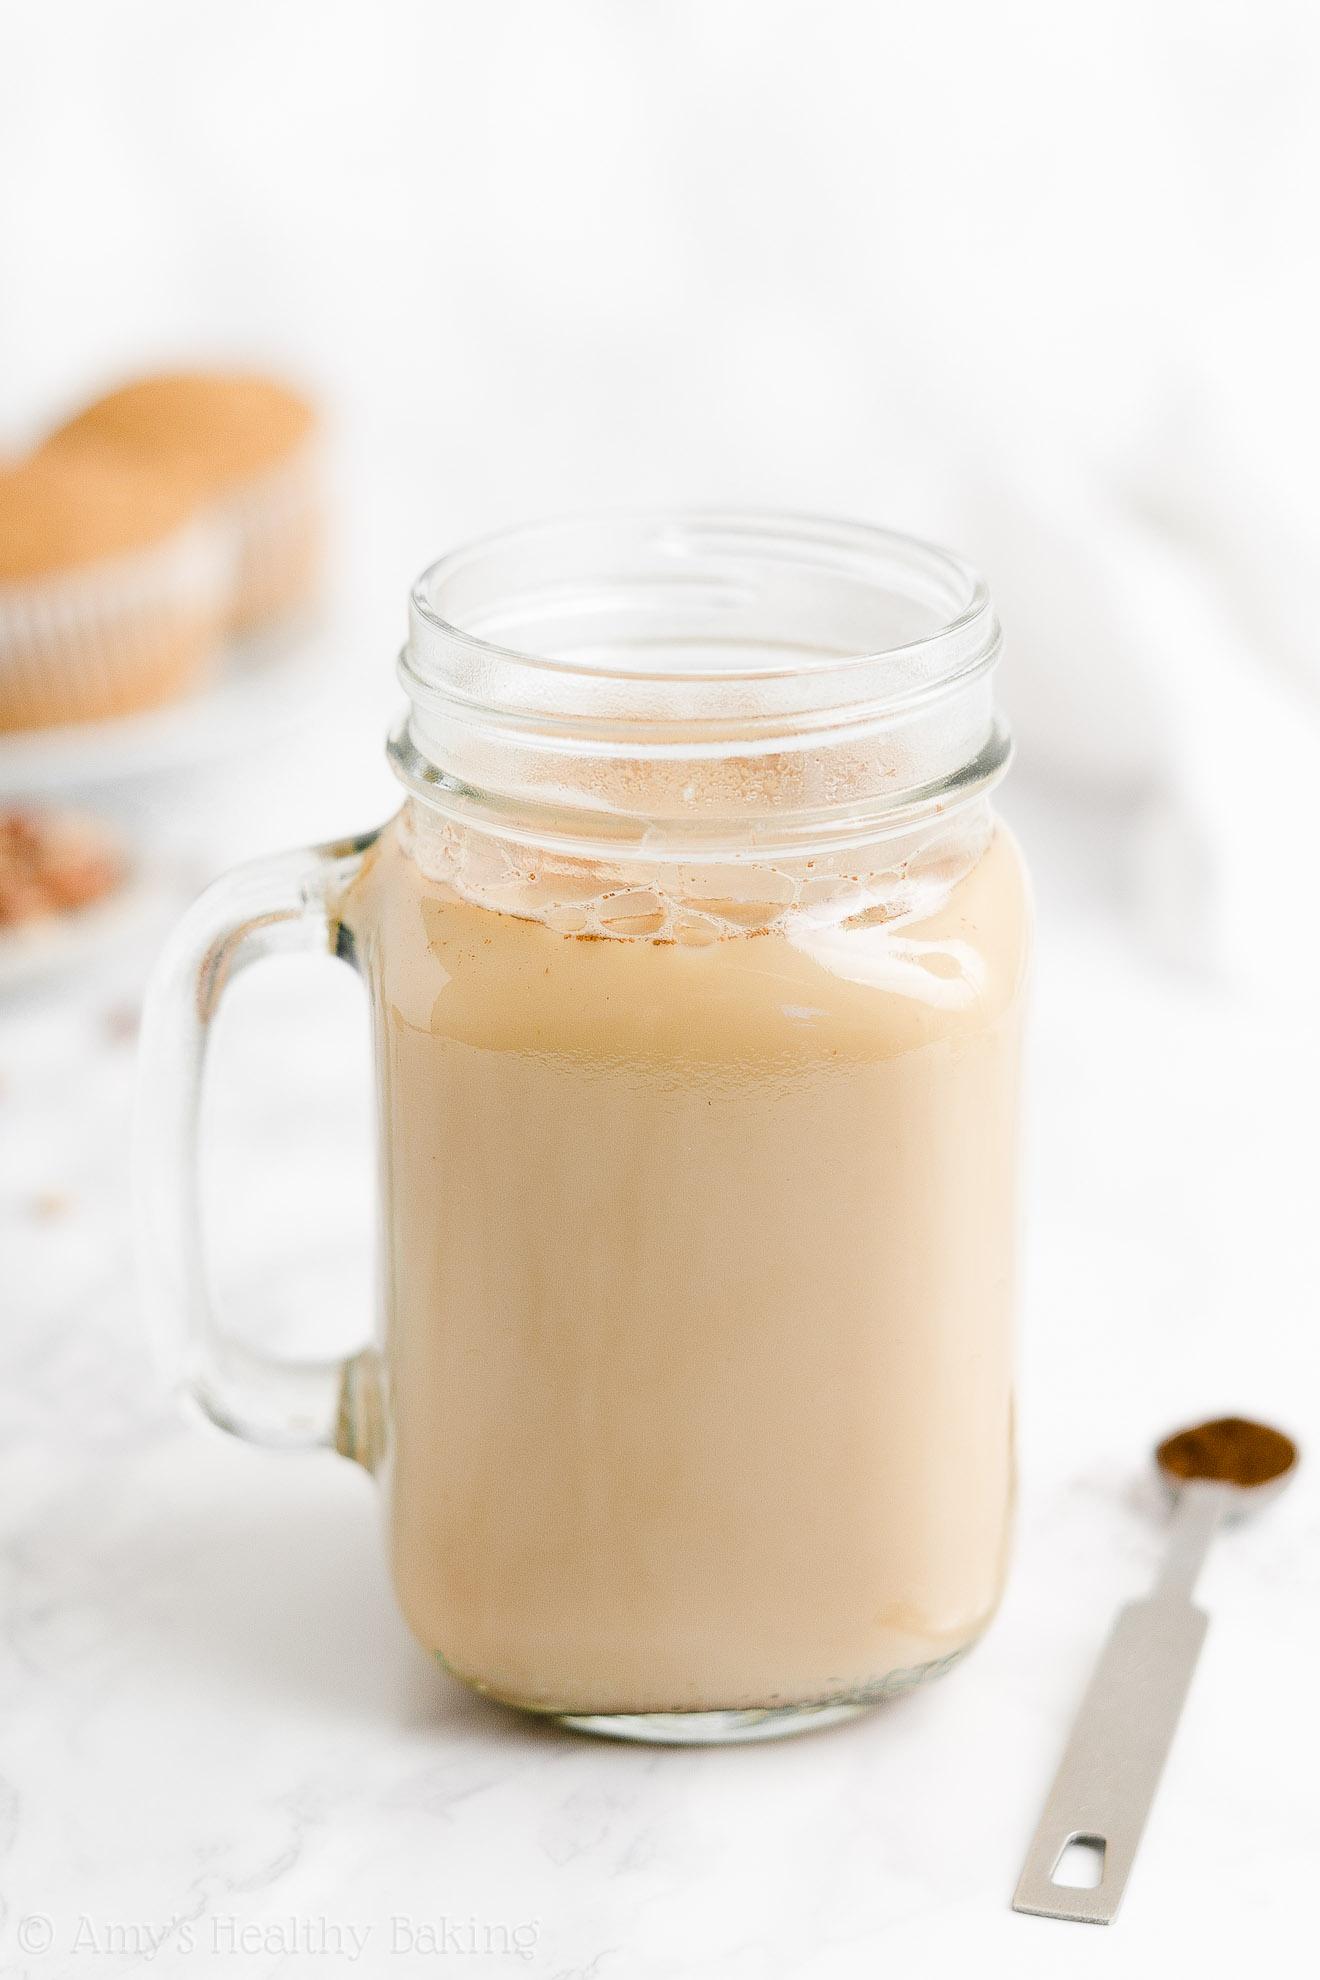 BEST EVER Easy Healthy Vegan Dairy Free Copycat Starbucks Eggnog Chai Latte